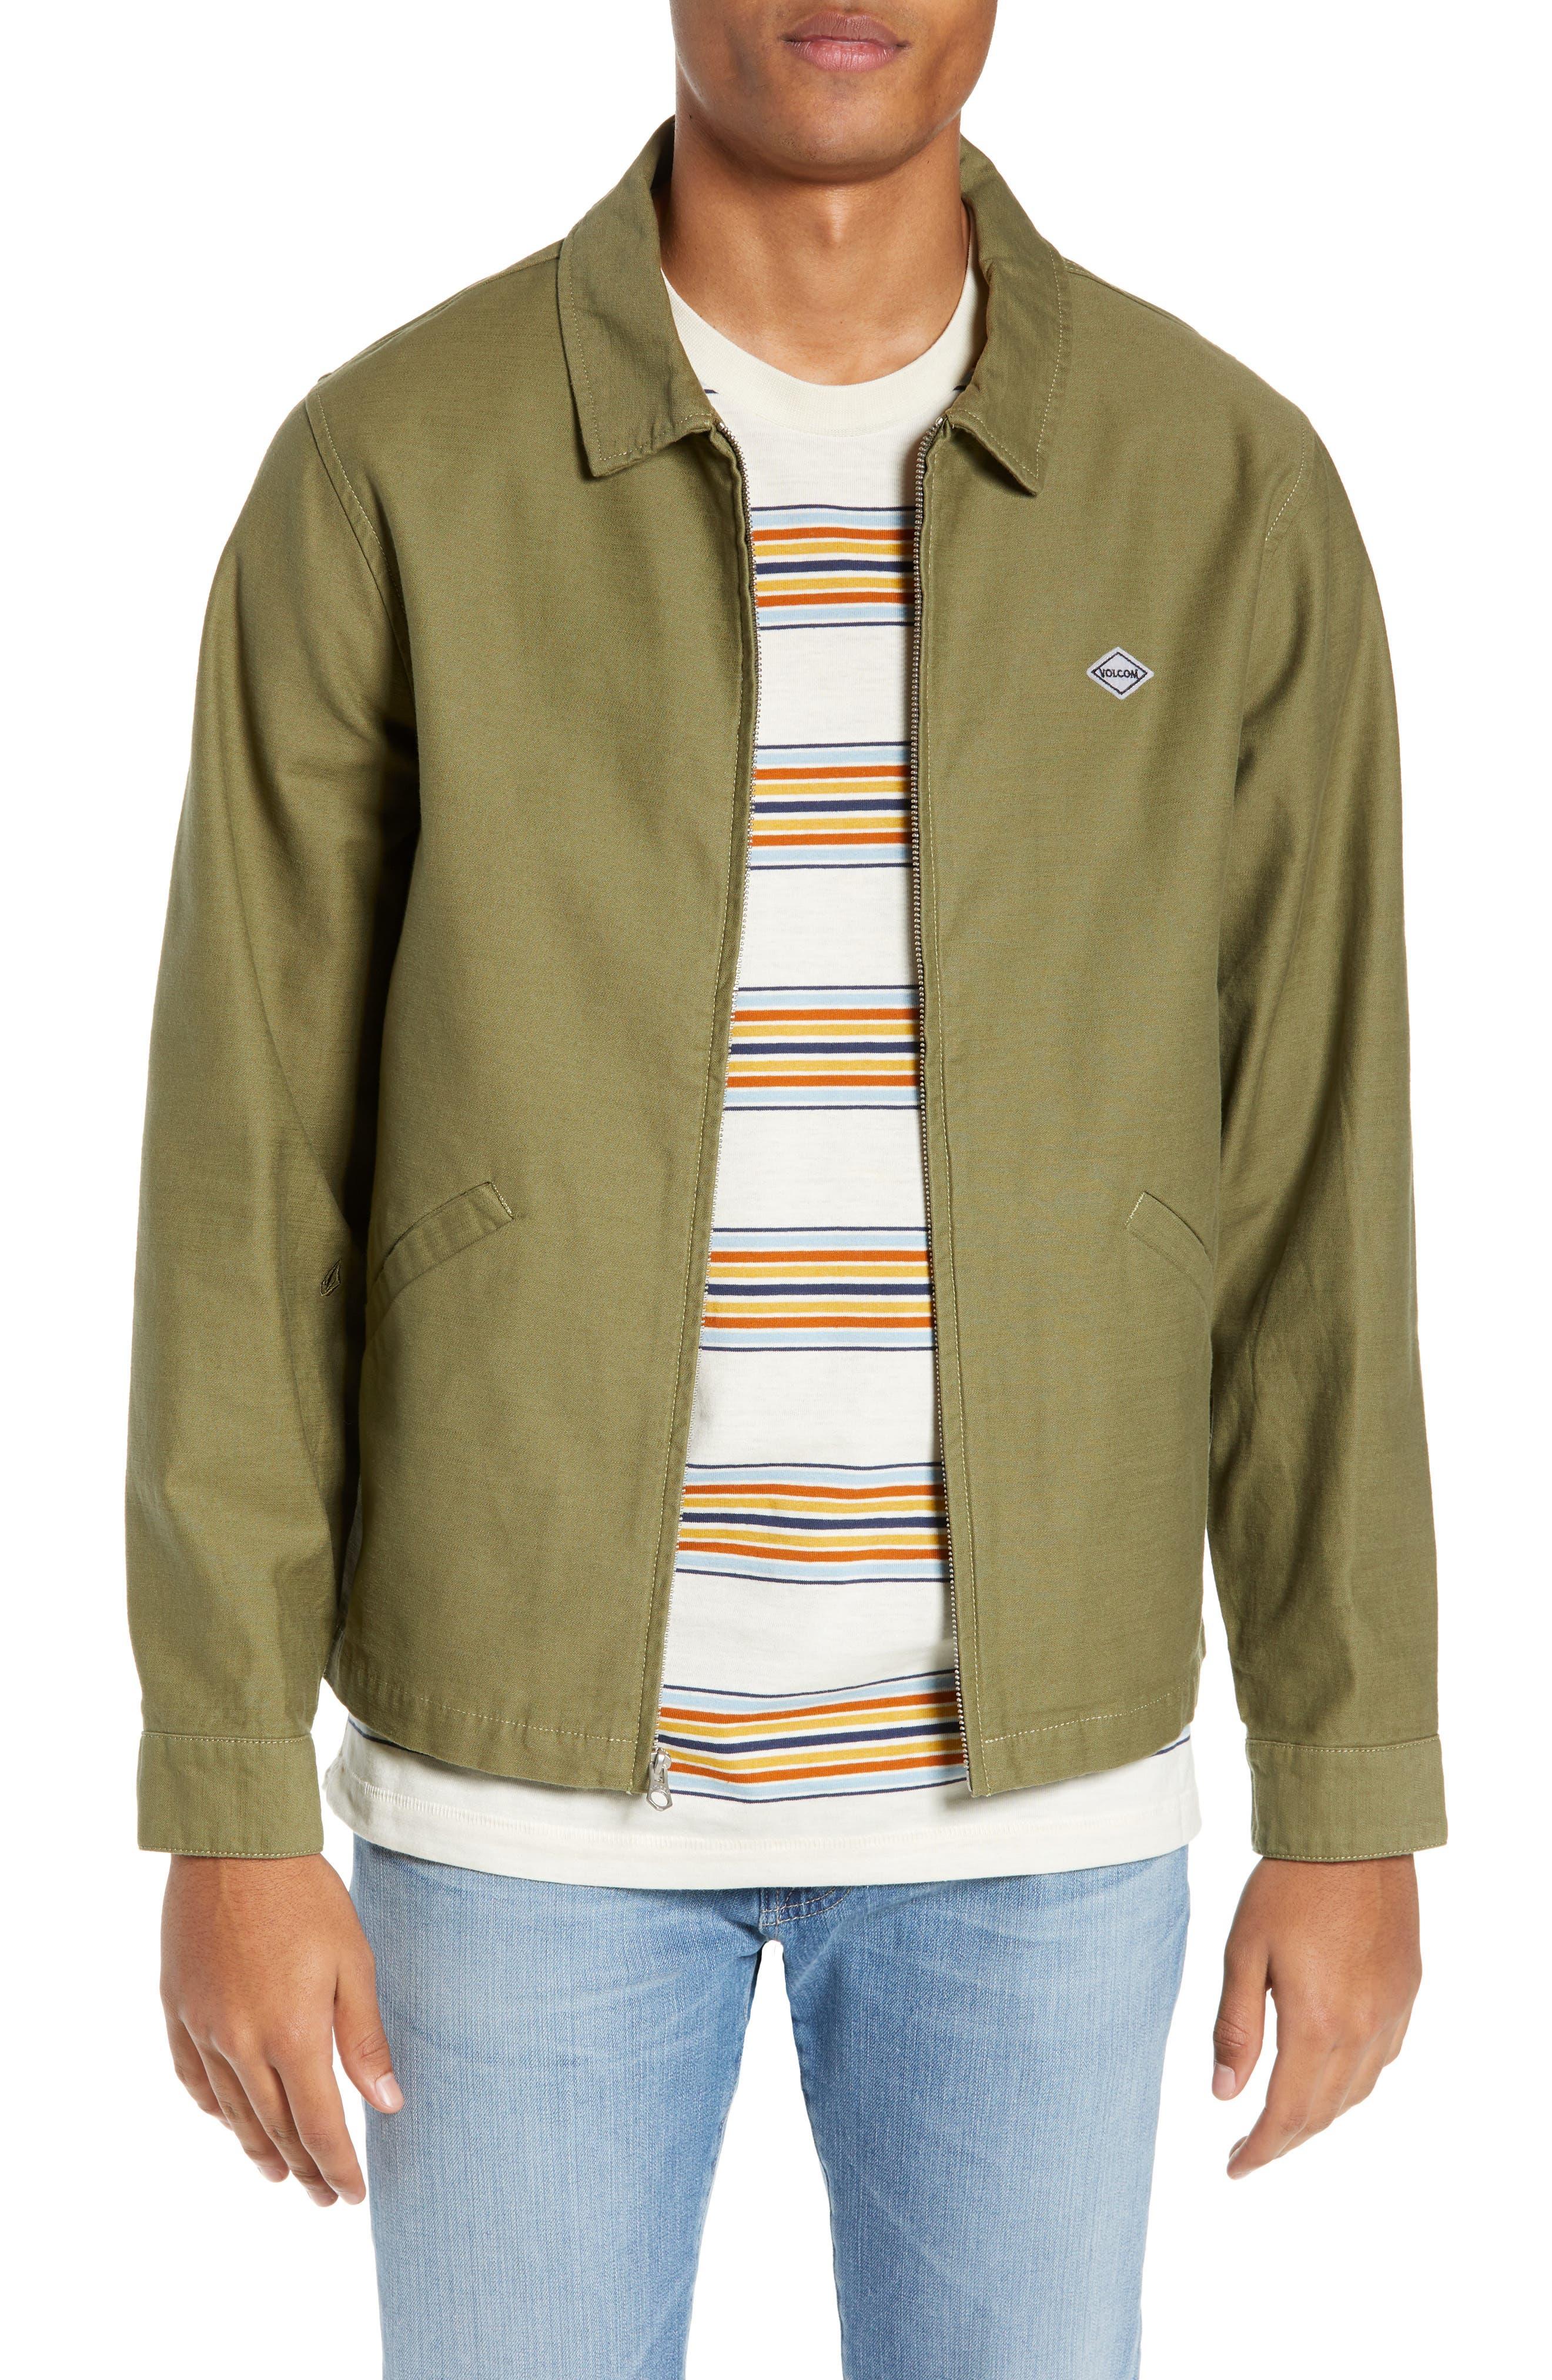 Burkey Jacket,                         Main,                         color, VINE GREEN